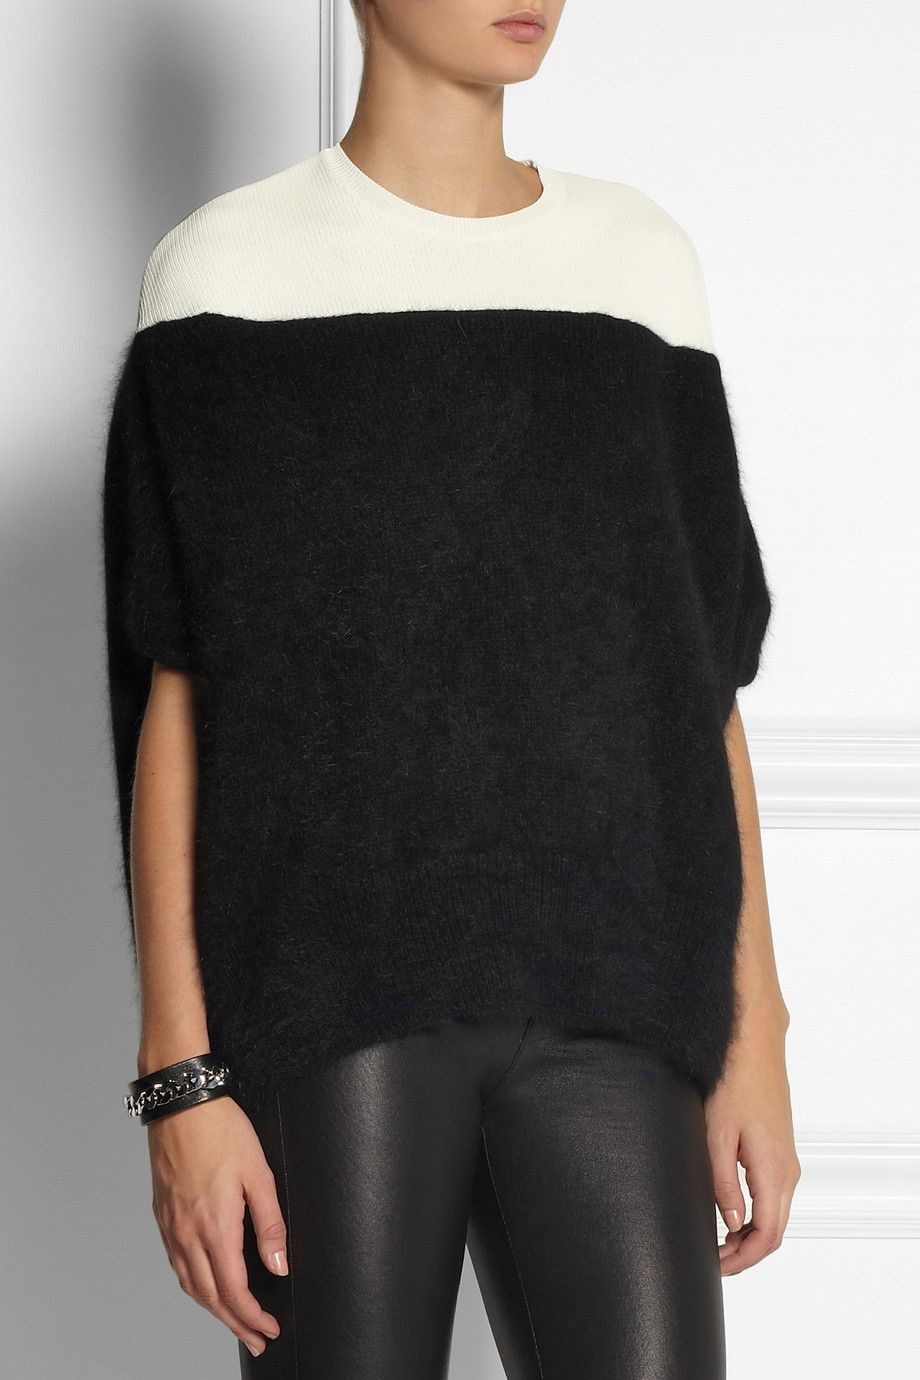 Giambattista Valli|Ribbed-knit and angora-blend top|NET-A-PORTER.COM